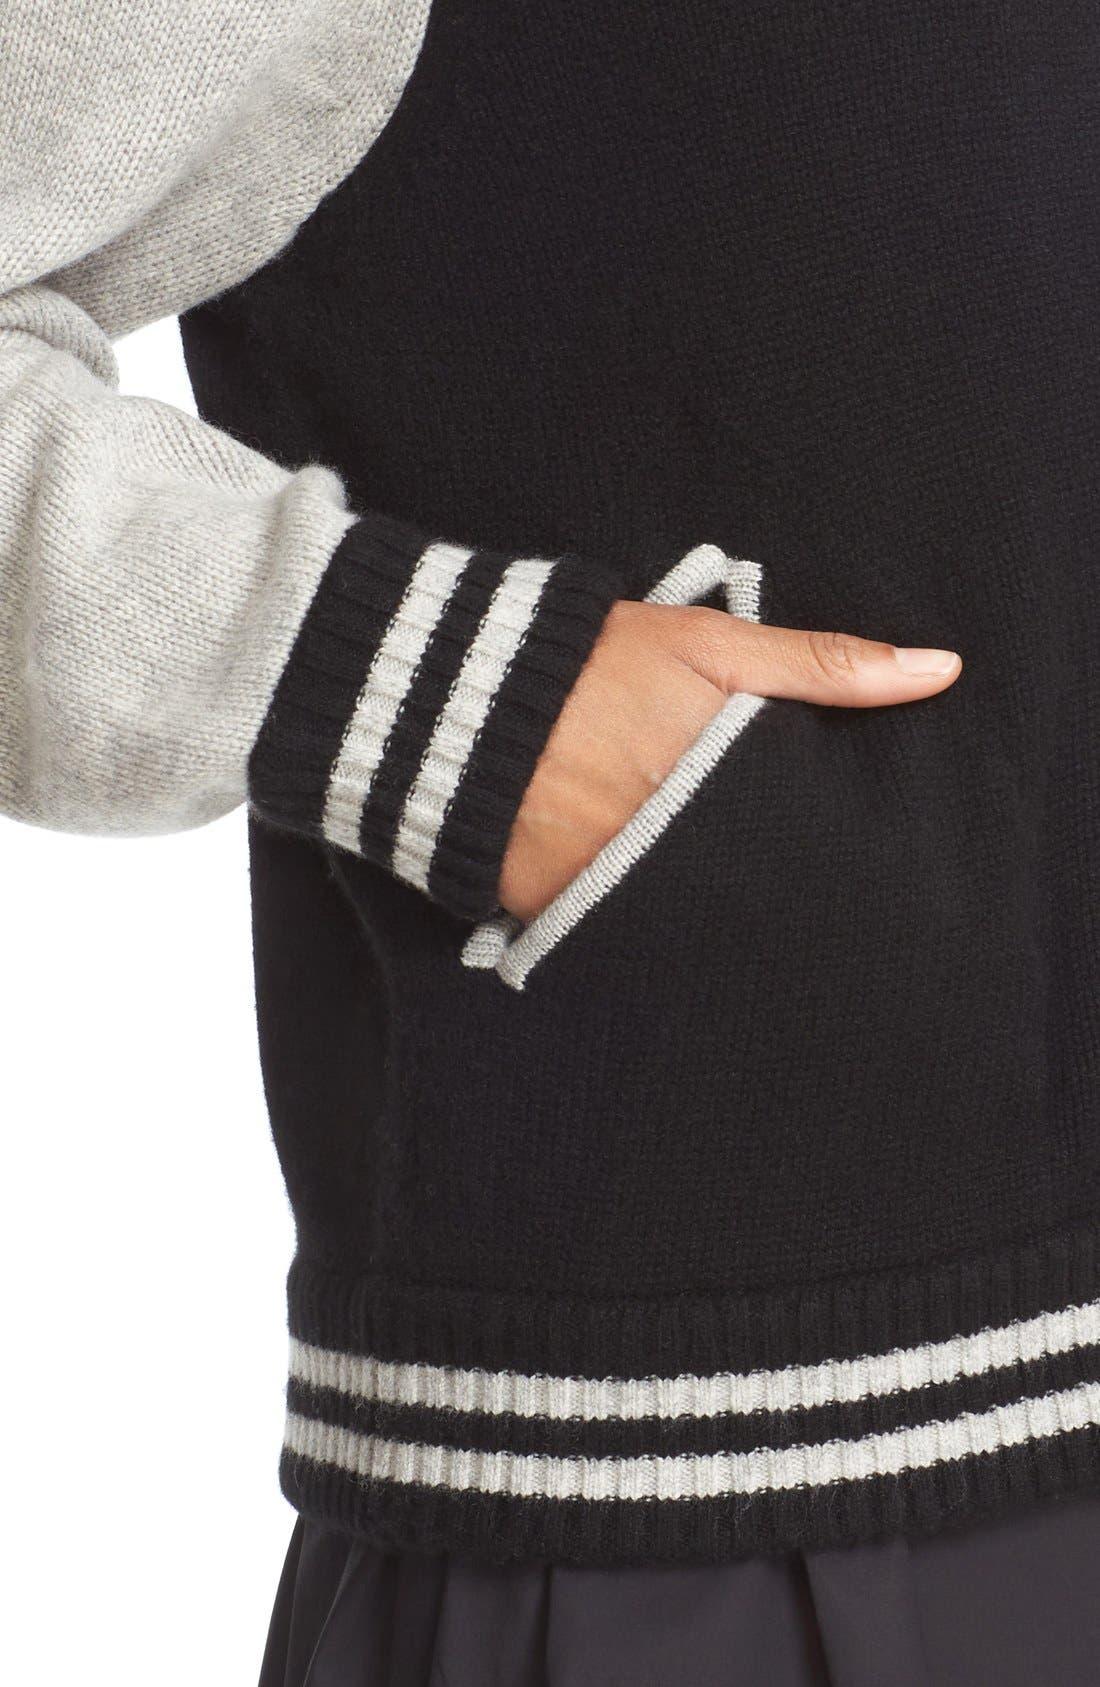 Stripe Detail Wool & Cashmere Knit Varsity Jacket,                             Alternate thumbnail 6, color,                             002